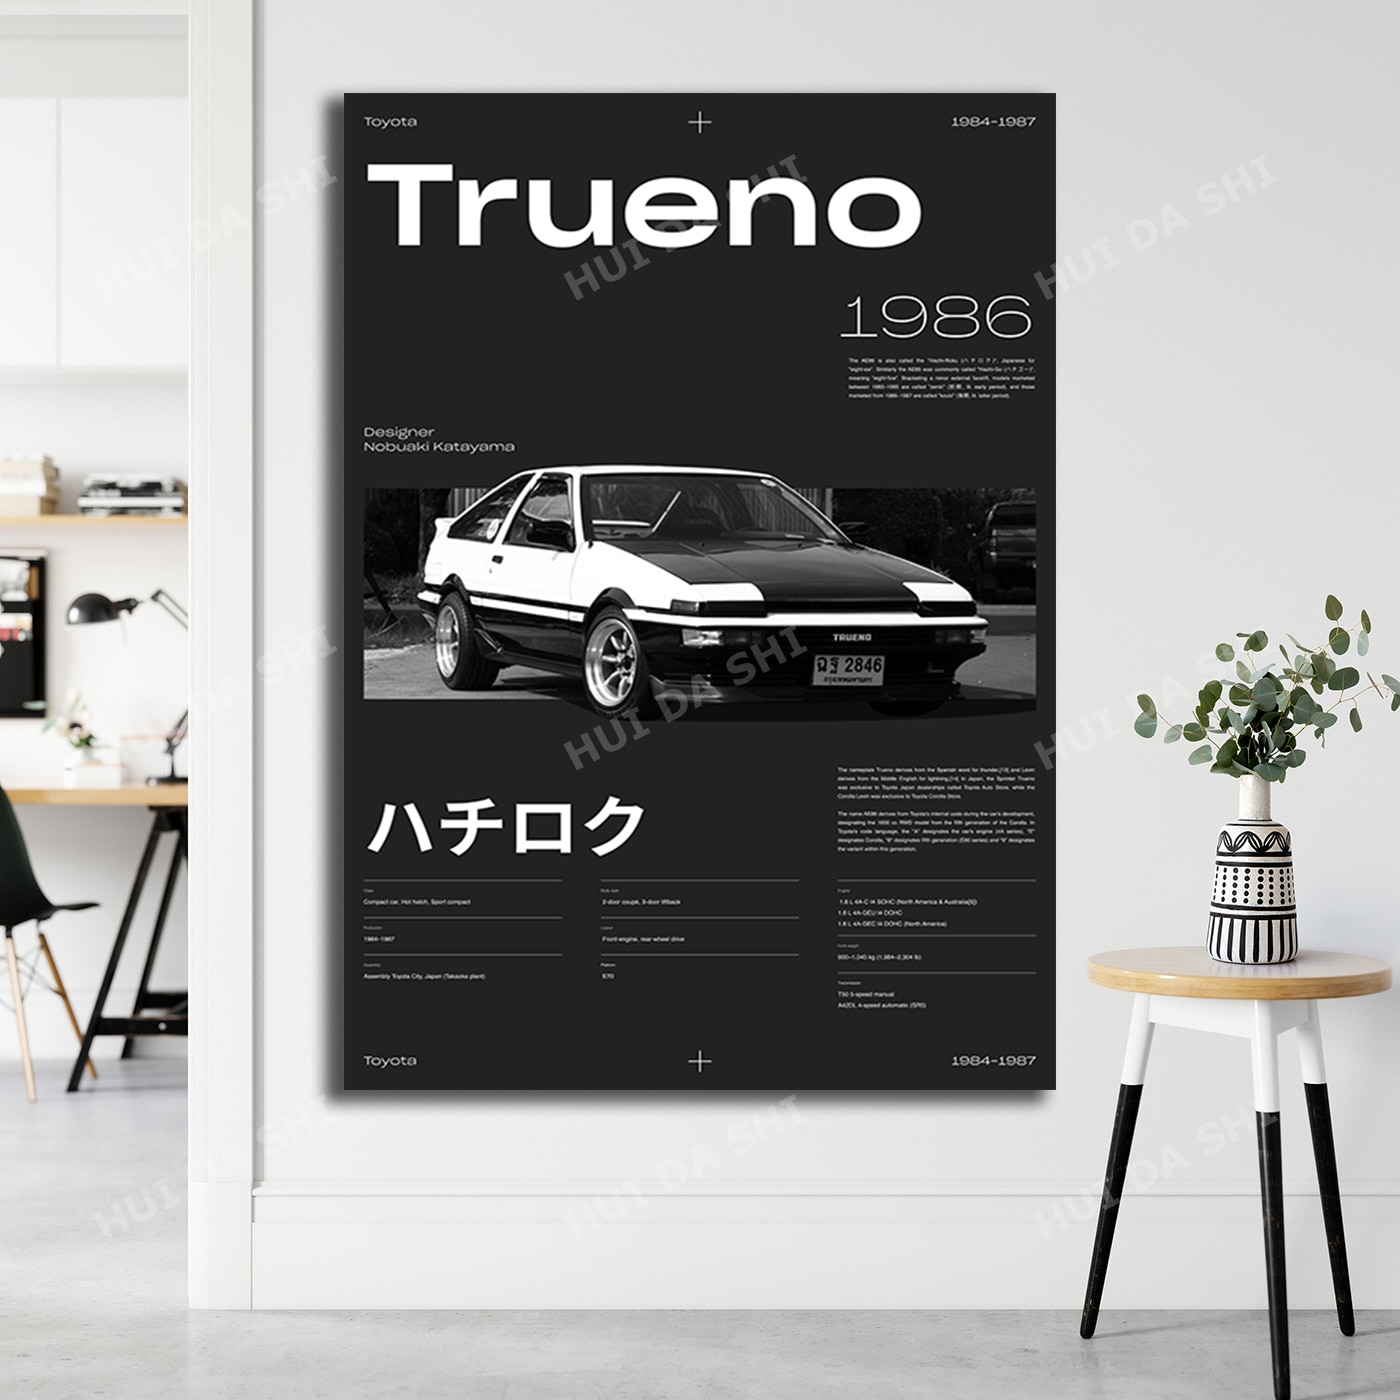 Toyota Trueno AE86 Печатный, JDM цифровой печатный плакат, плакат JDM с классическими японскими автомобилями, плакат Toyota Trueno, Ae86,